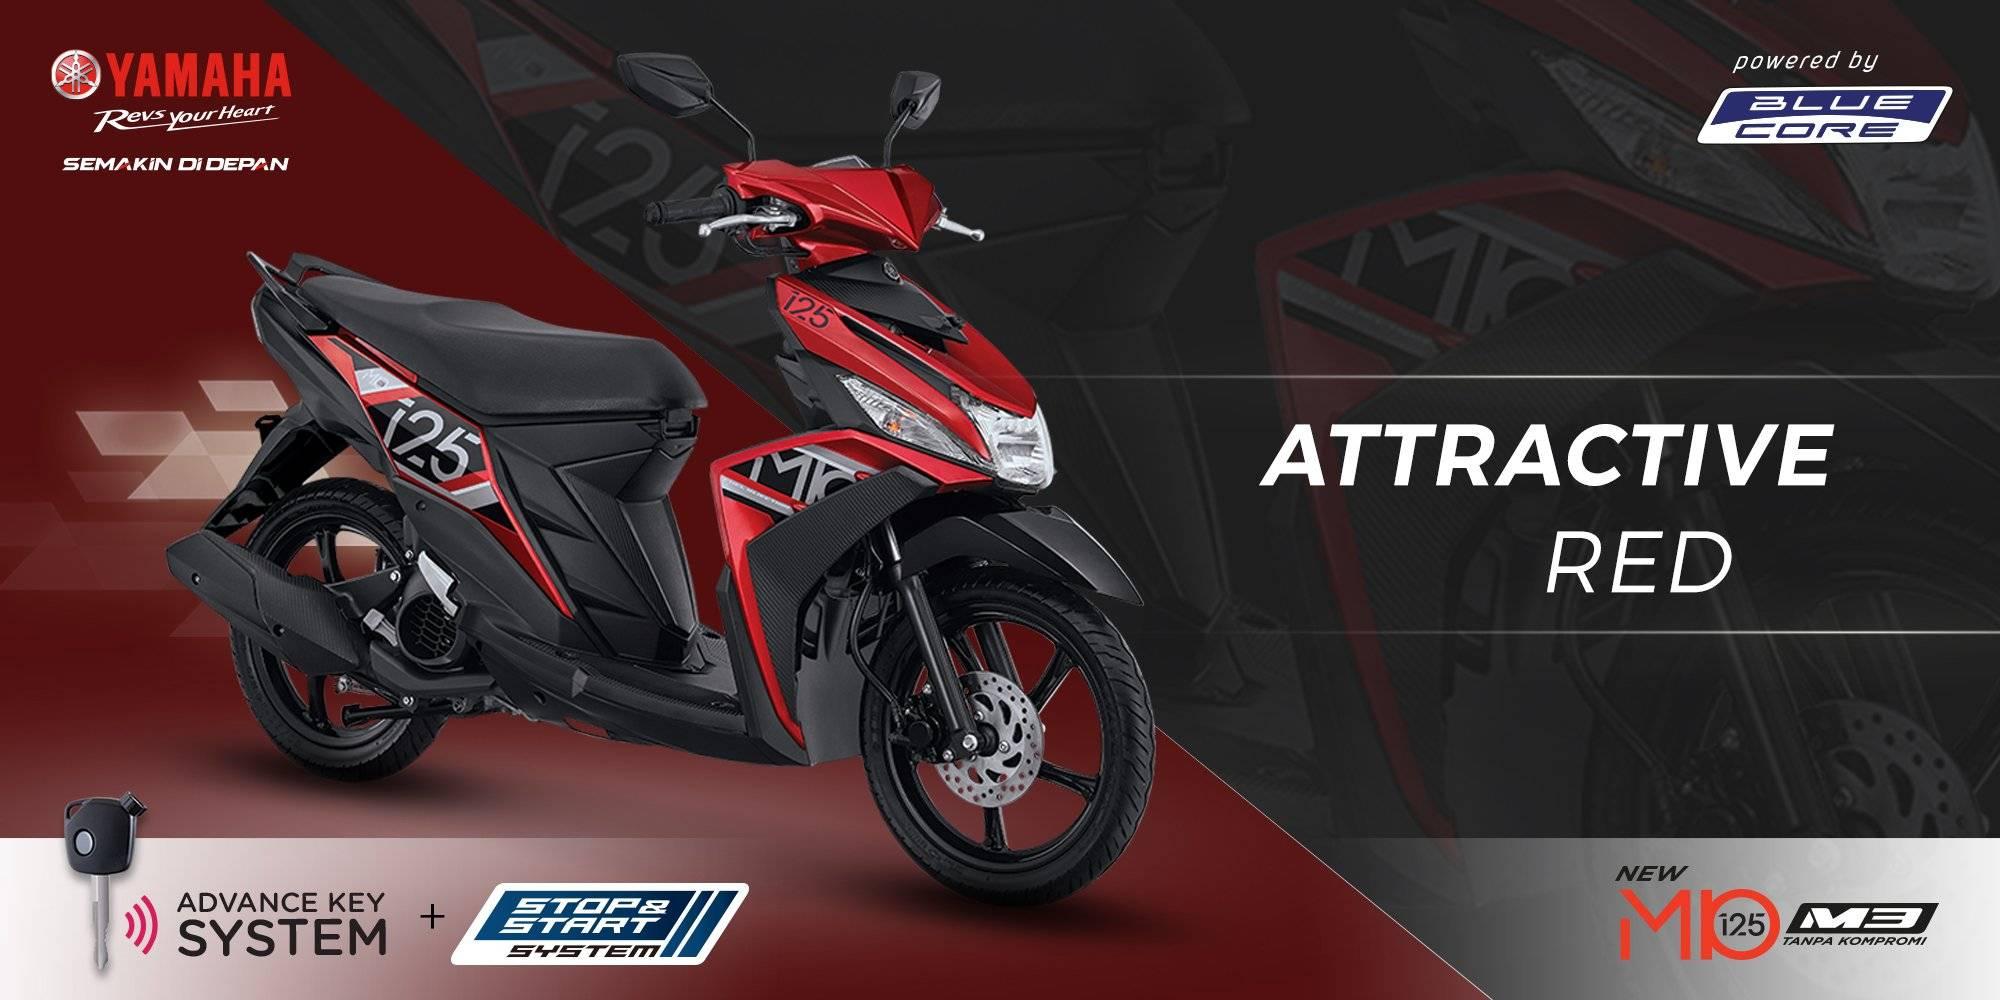 Daftar Harga Motor Yamaha Terbaru 2019 Lengkap Dari Freego Mio